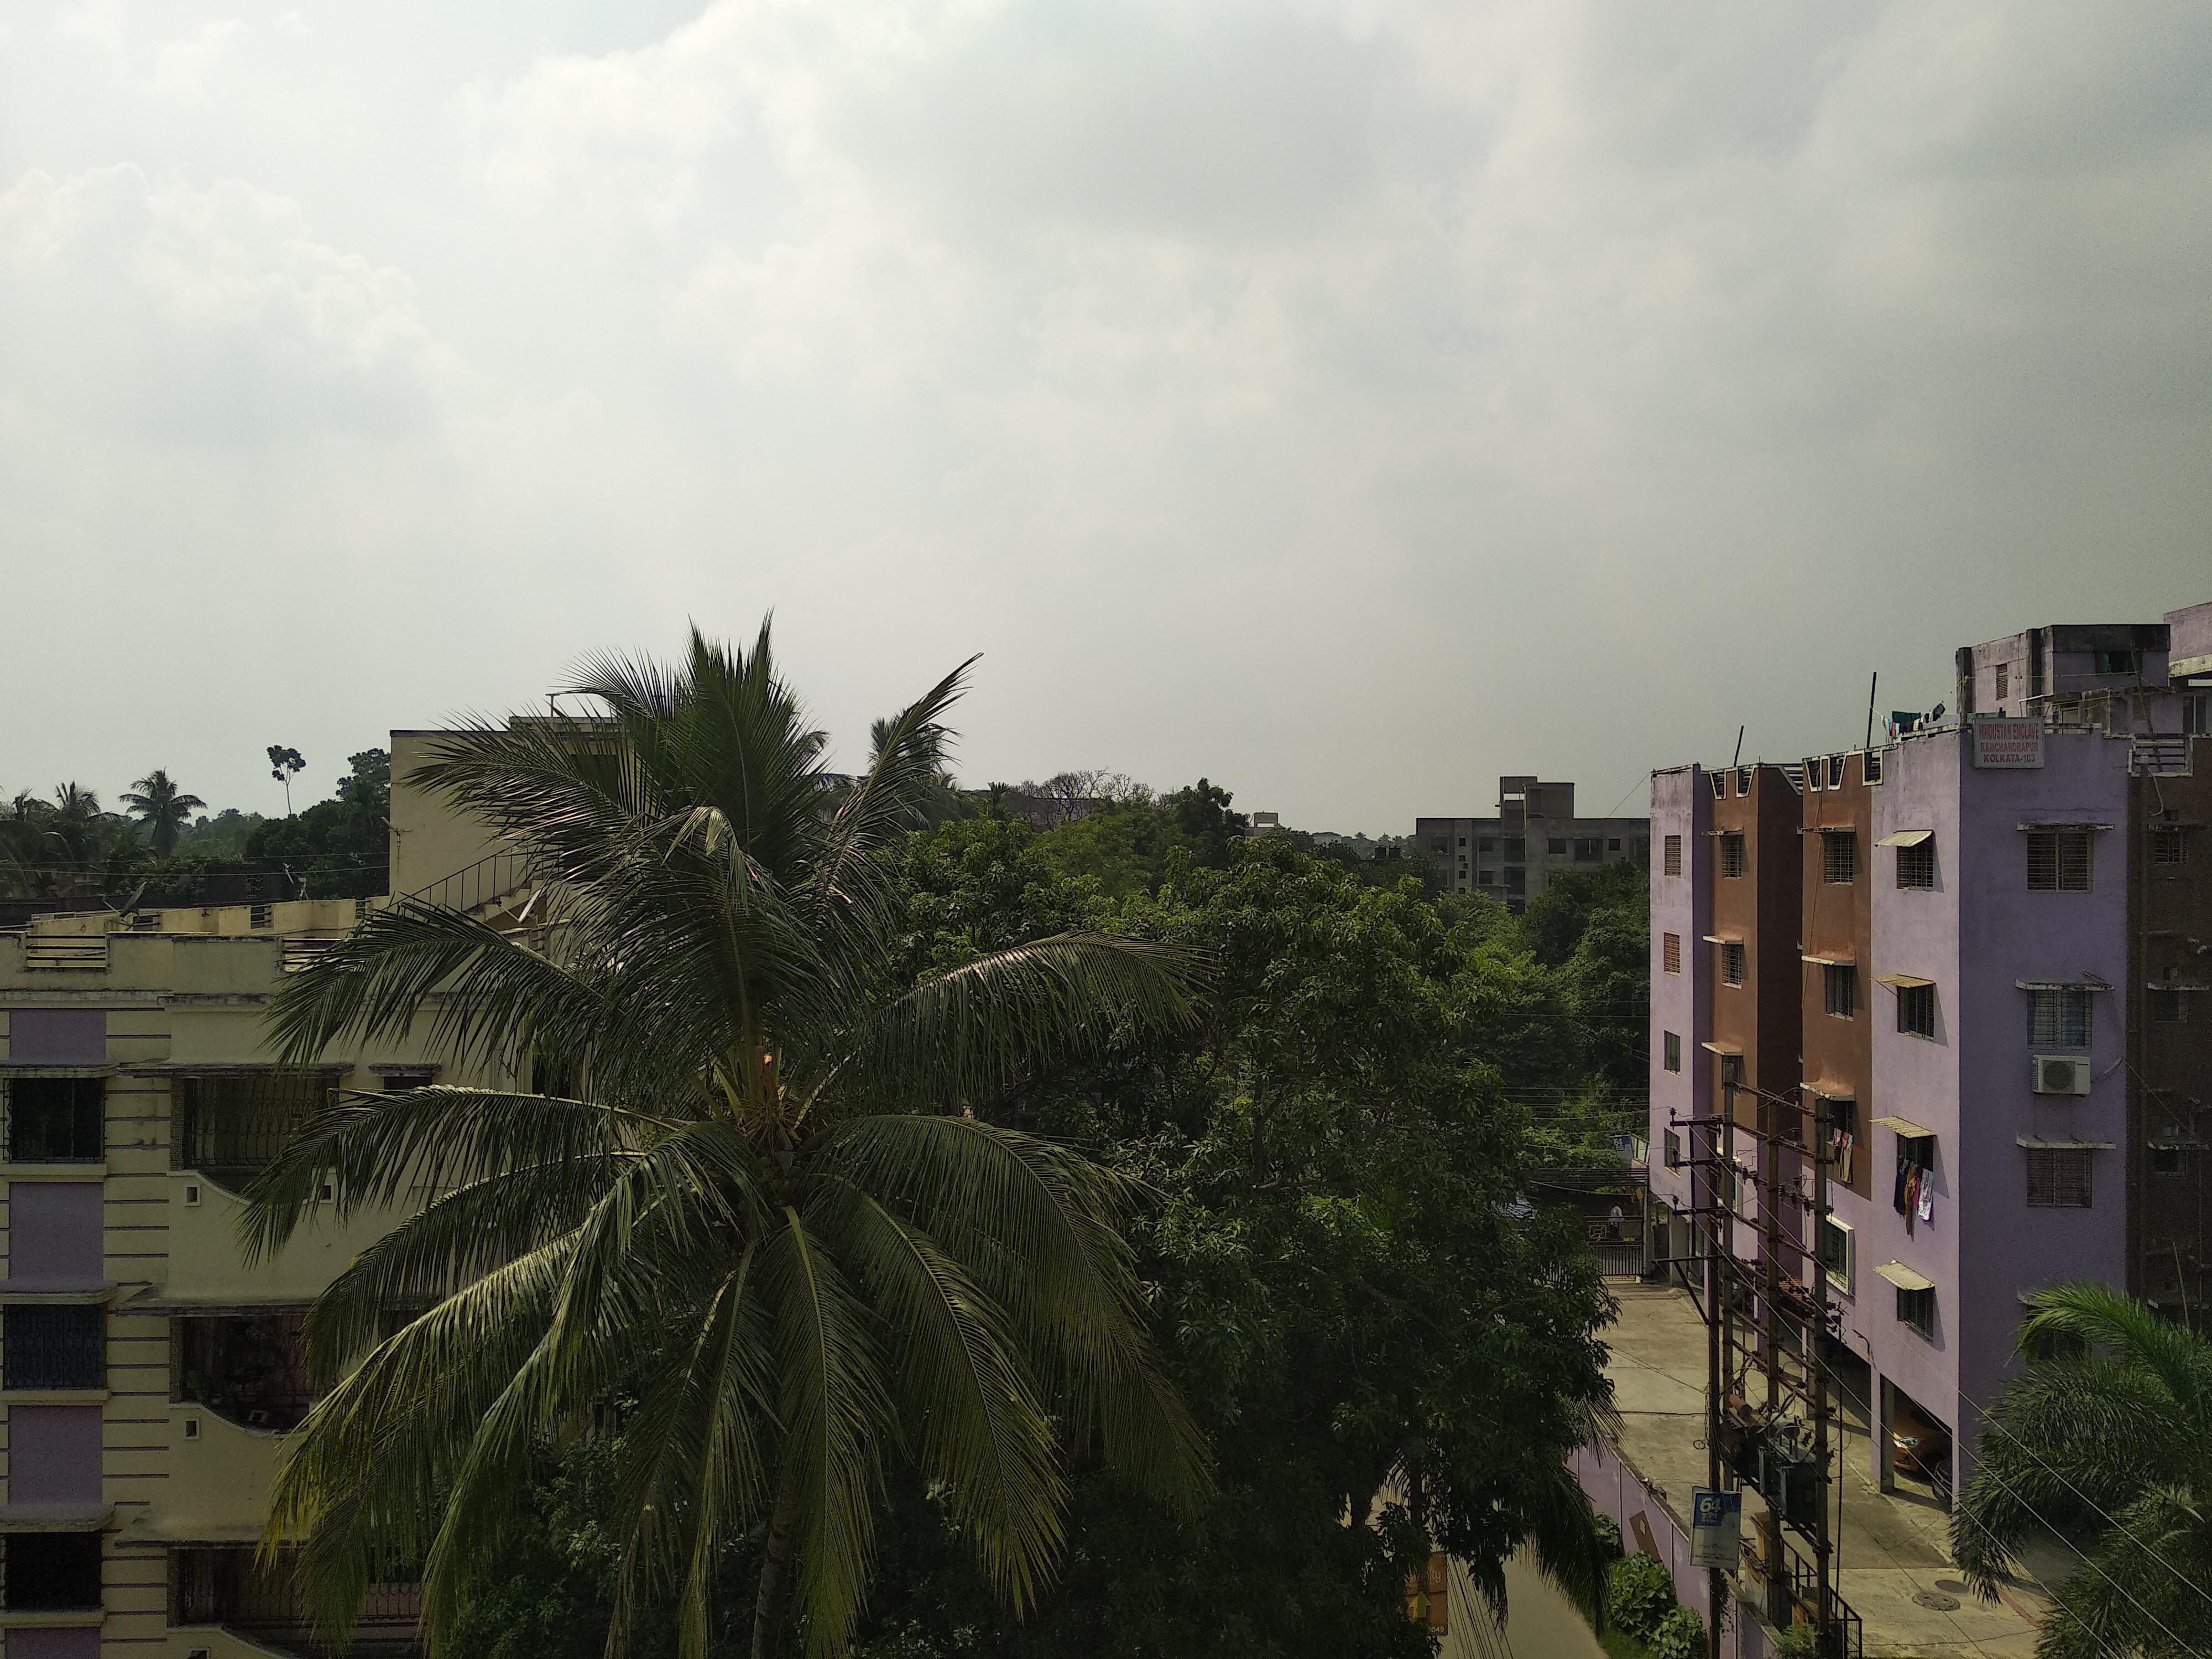 Kolkata Weather Update: দুর্গাপুজোর পরে কি কালীপুজোতেও বৃষ্টি? চিন্তায় শহরবাসী